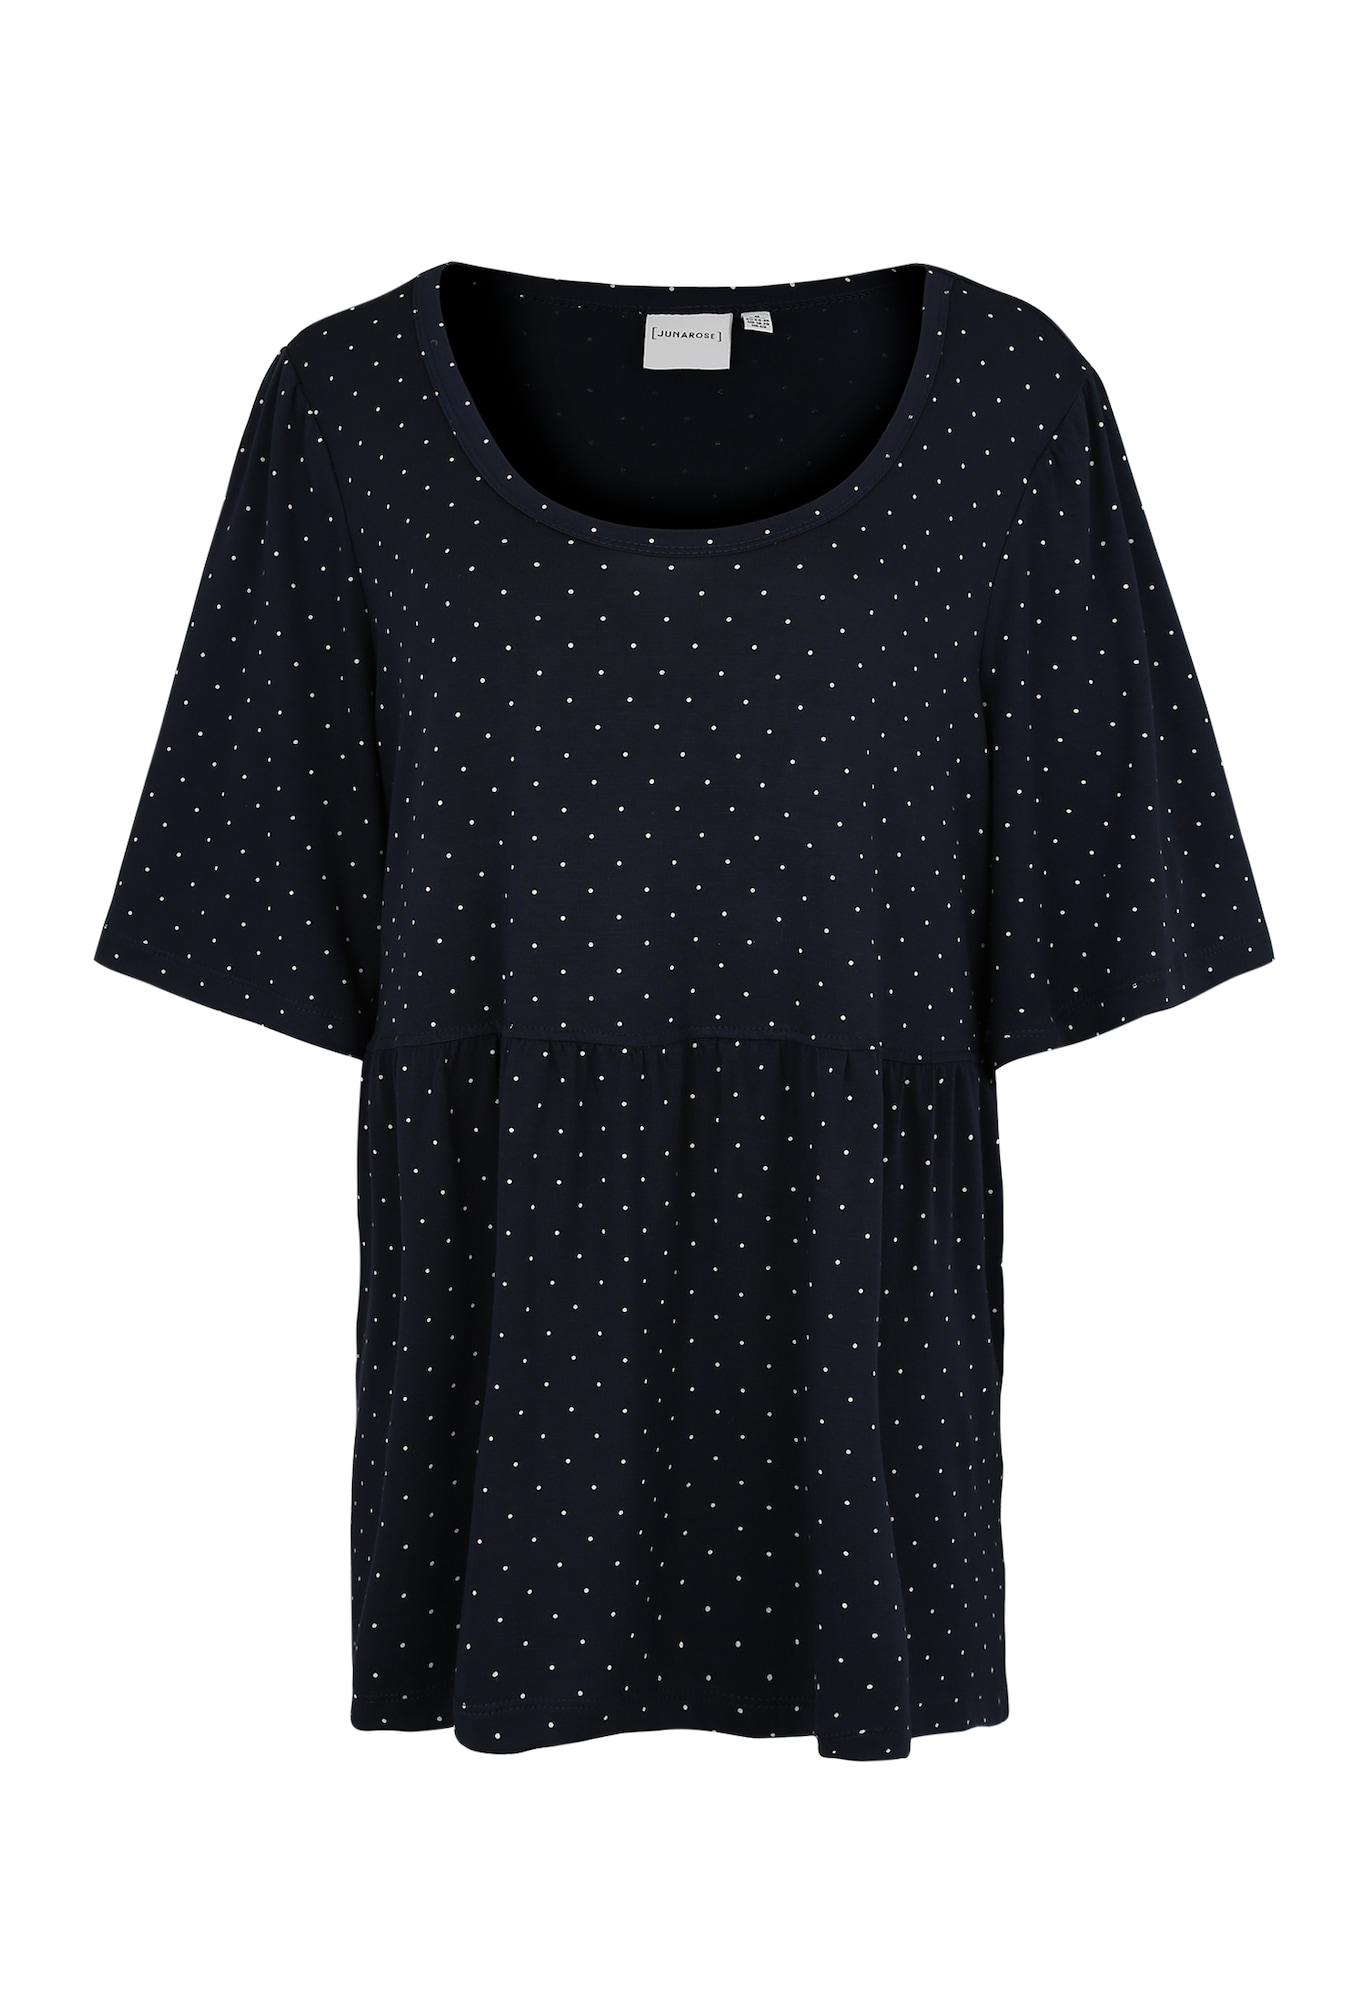 Tričko JRANASTA námořnická modř bílá Junarose